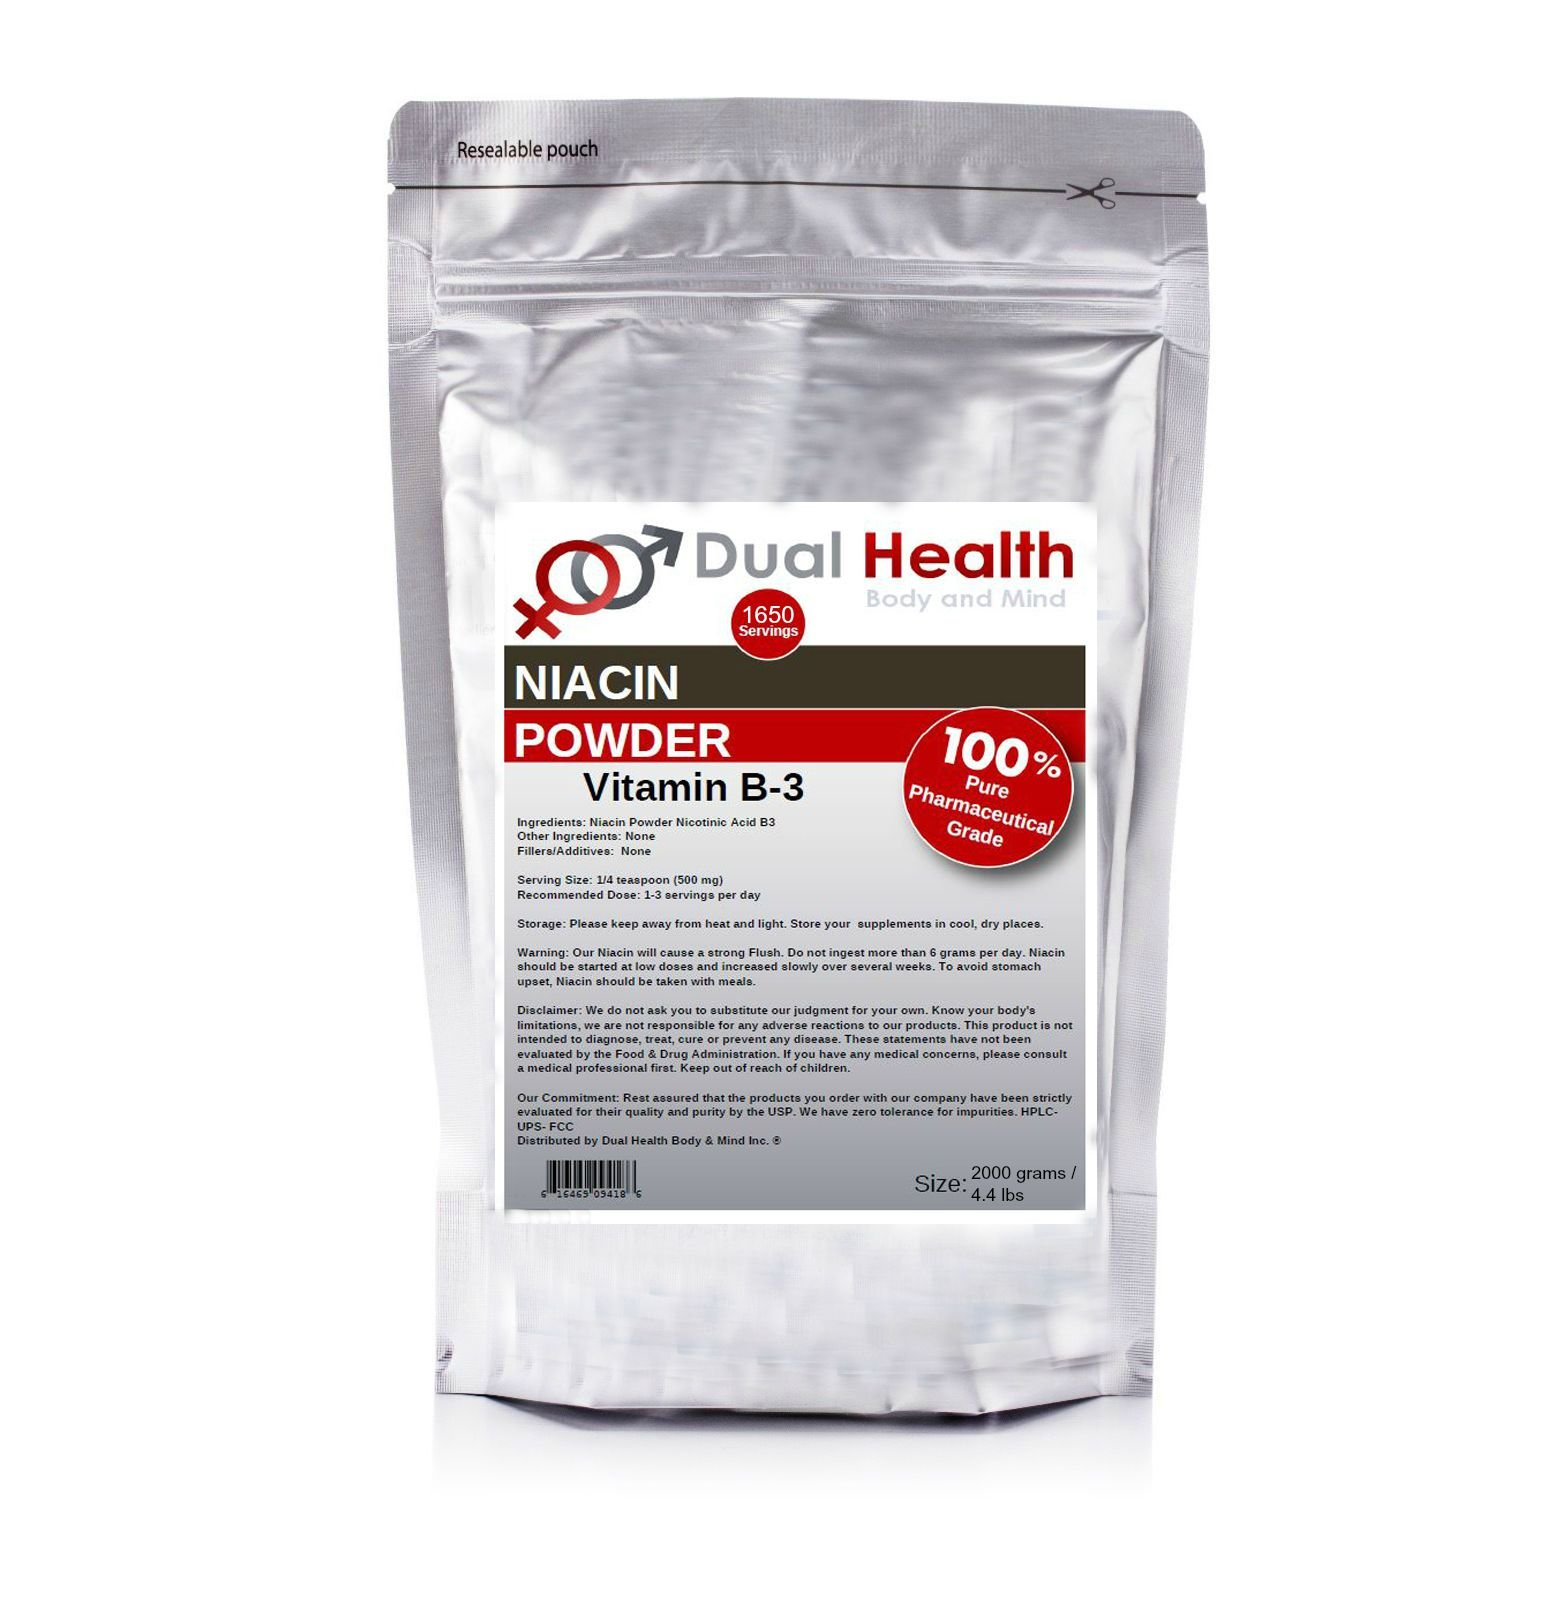 Pure Niacin (2000 grams (4.4 lbs)) Vitamin B3 Nicotinic Acid Powder Bulk Supplements